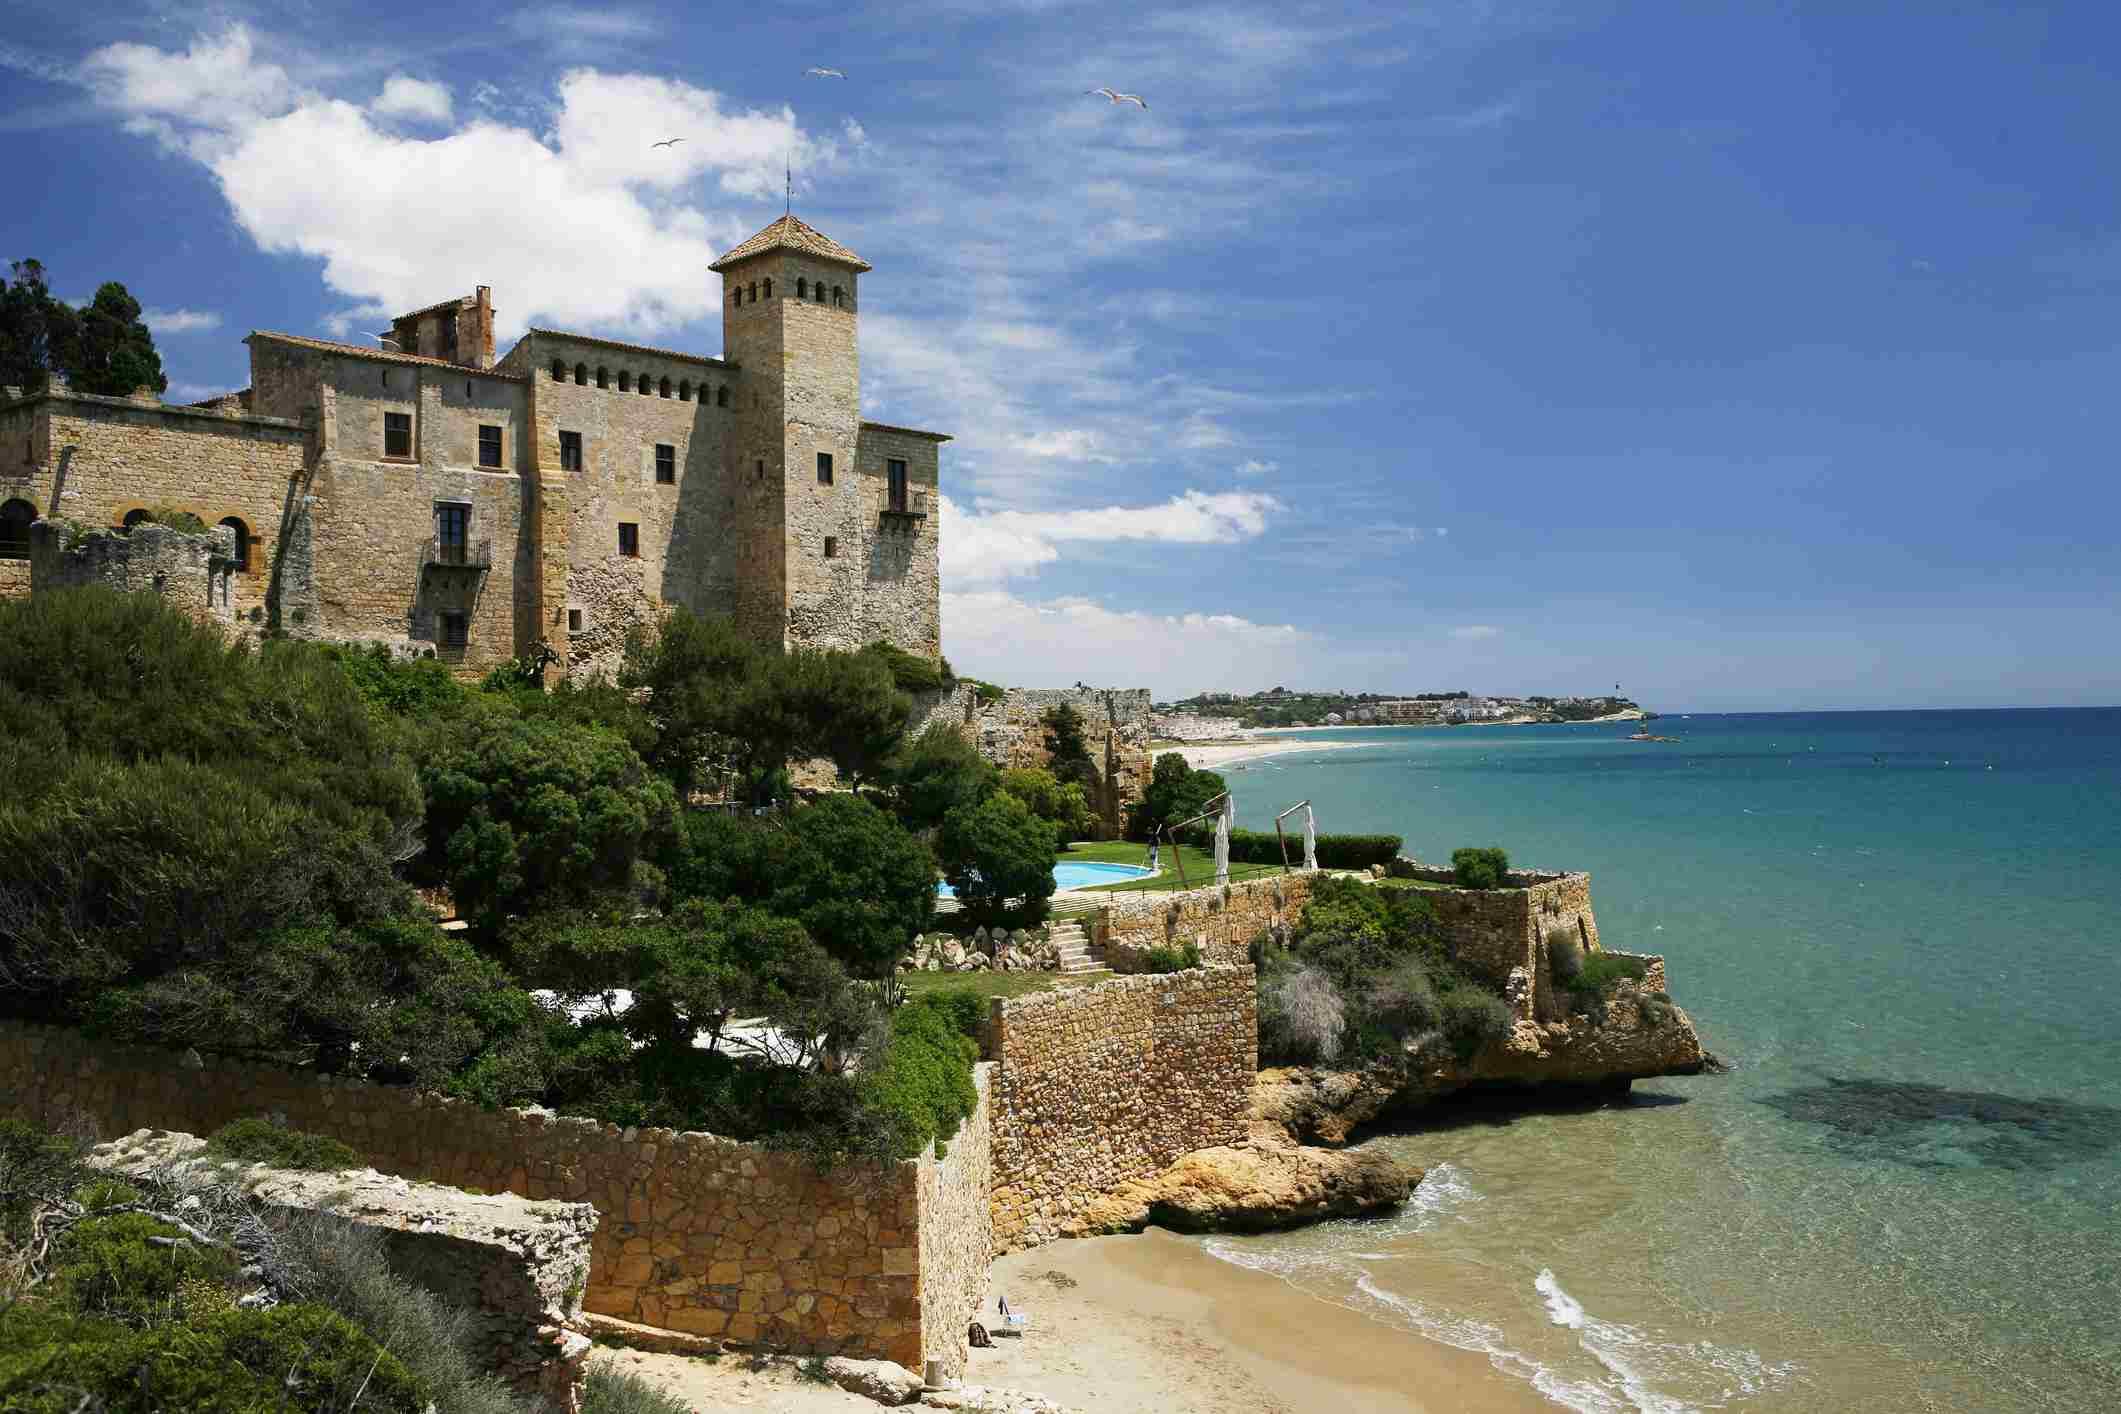 Costa mediterránea de Tarragona, Tamarit, Cataluña, España, Europa